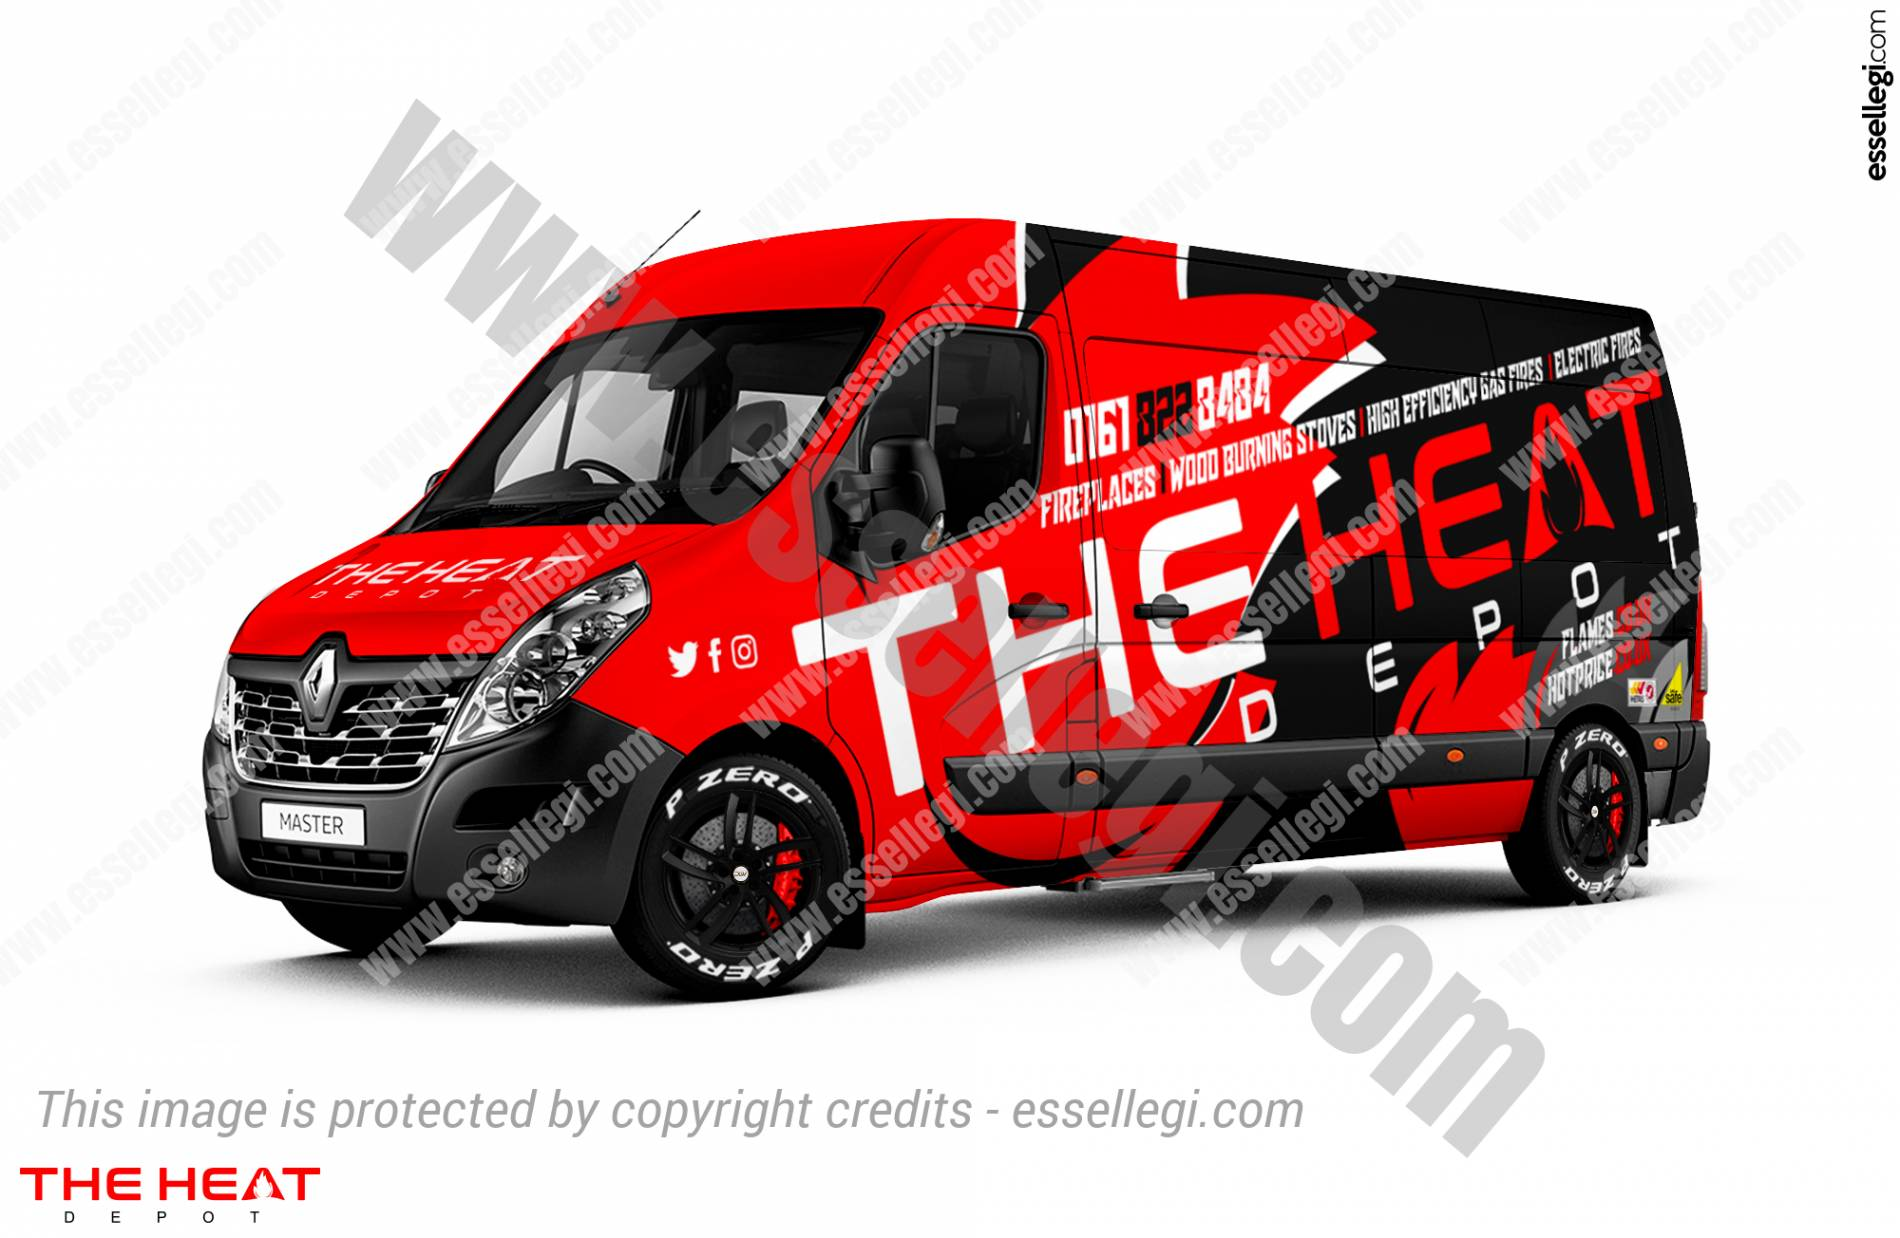 Renault Master Wrap Design. Renault Master | Van Wrap Design by Essellegi. Van Signs, Van Signage, Van Wrapping, Van Signwriting, Van Wrap Designer, Signs for Van, Van Logo, Van Graphic by Essellegi.